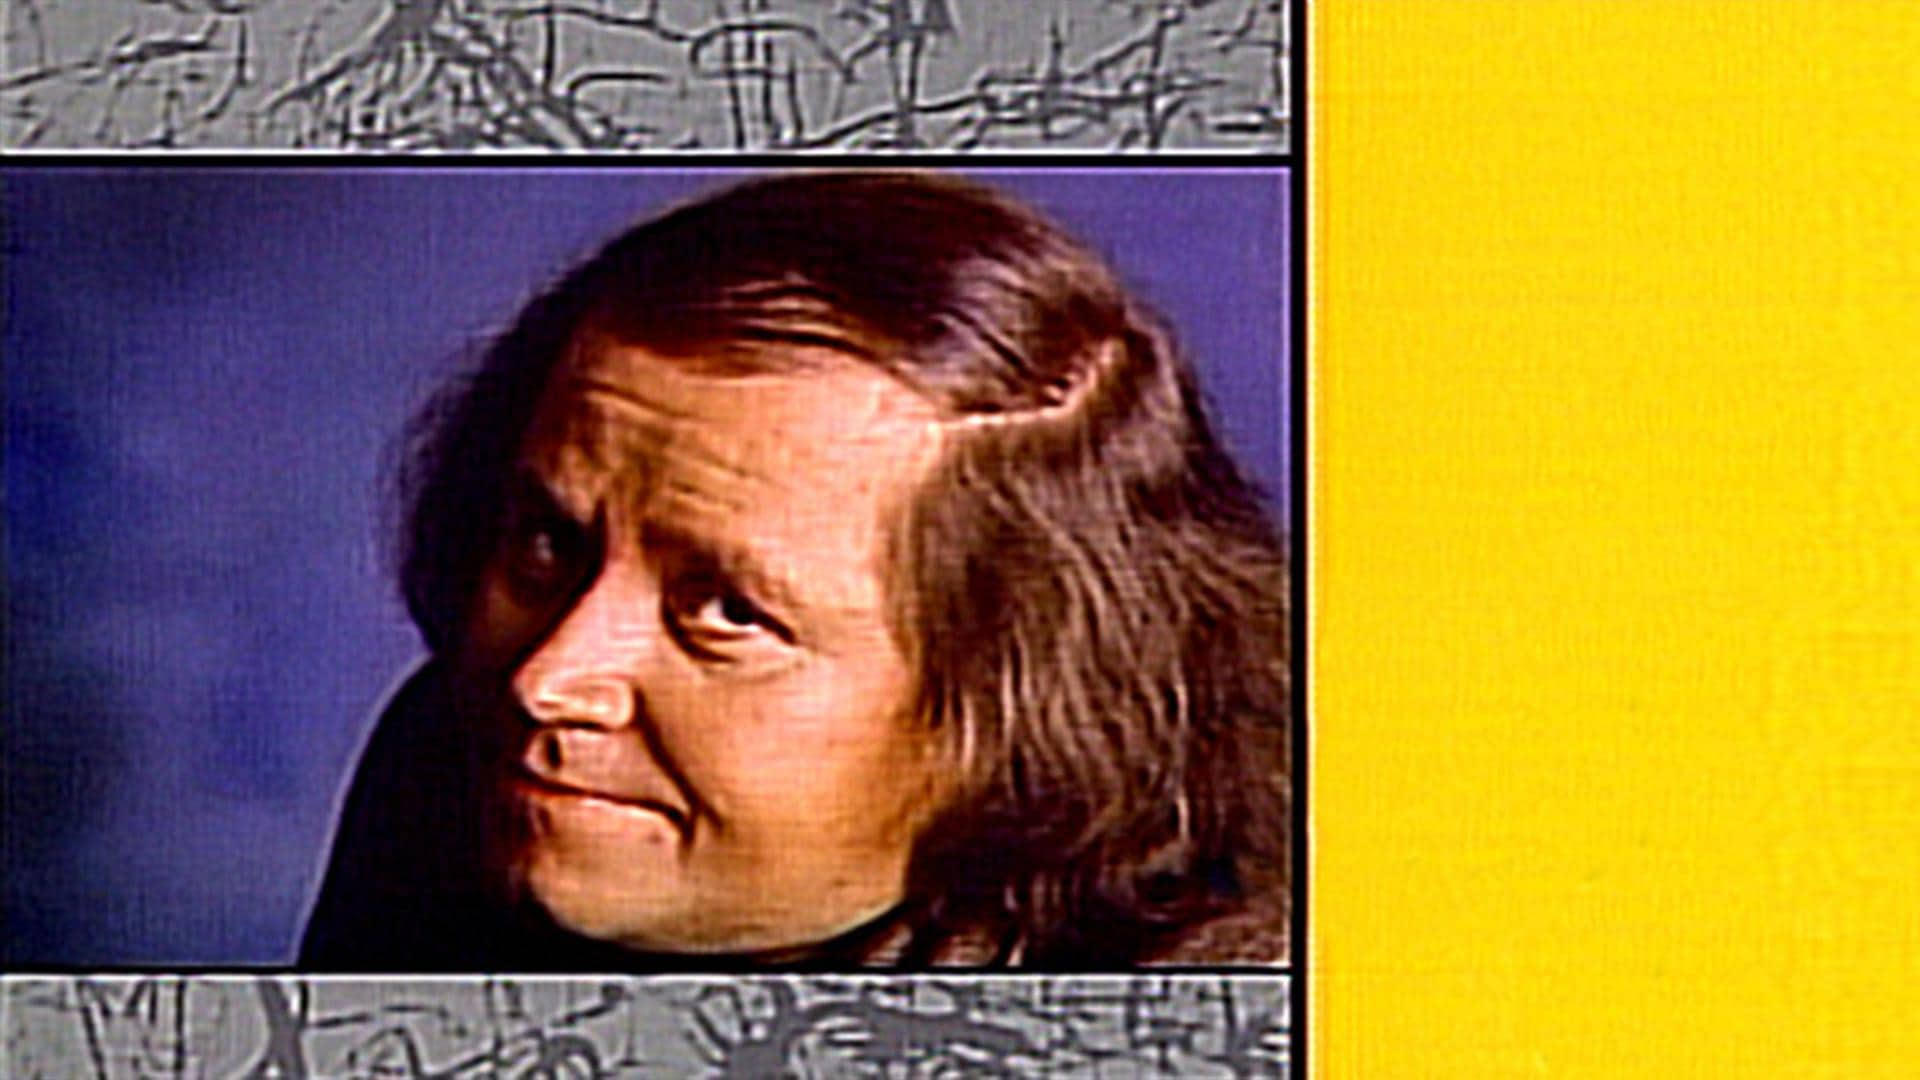 Sam Kinison: November 15, 1986